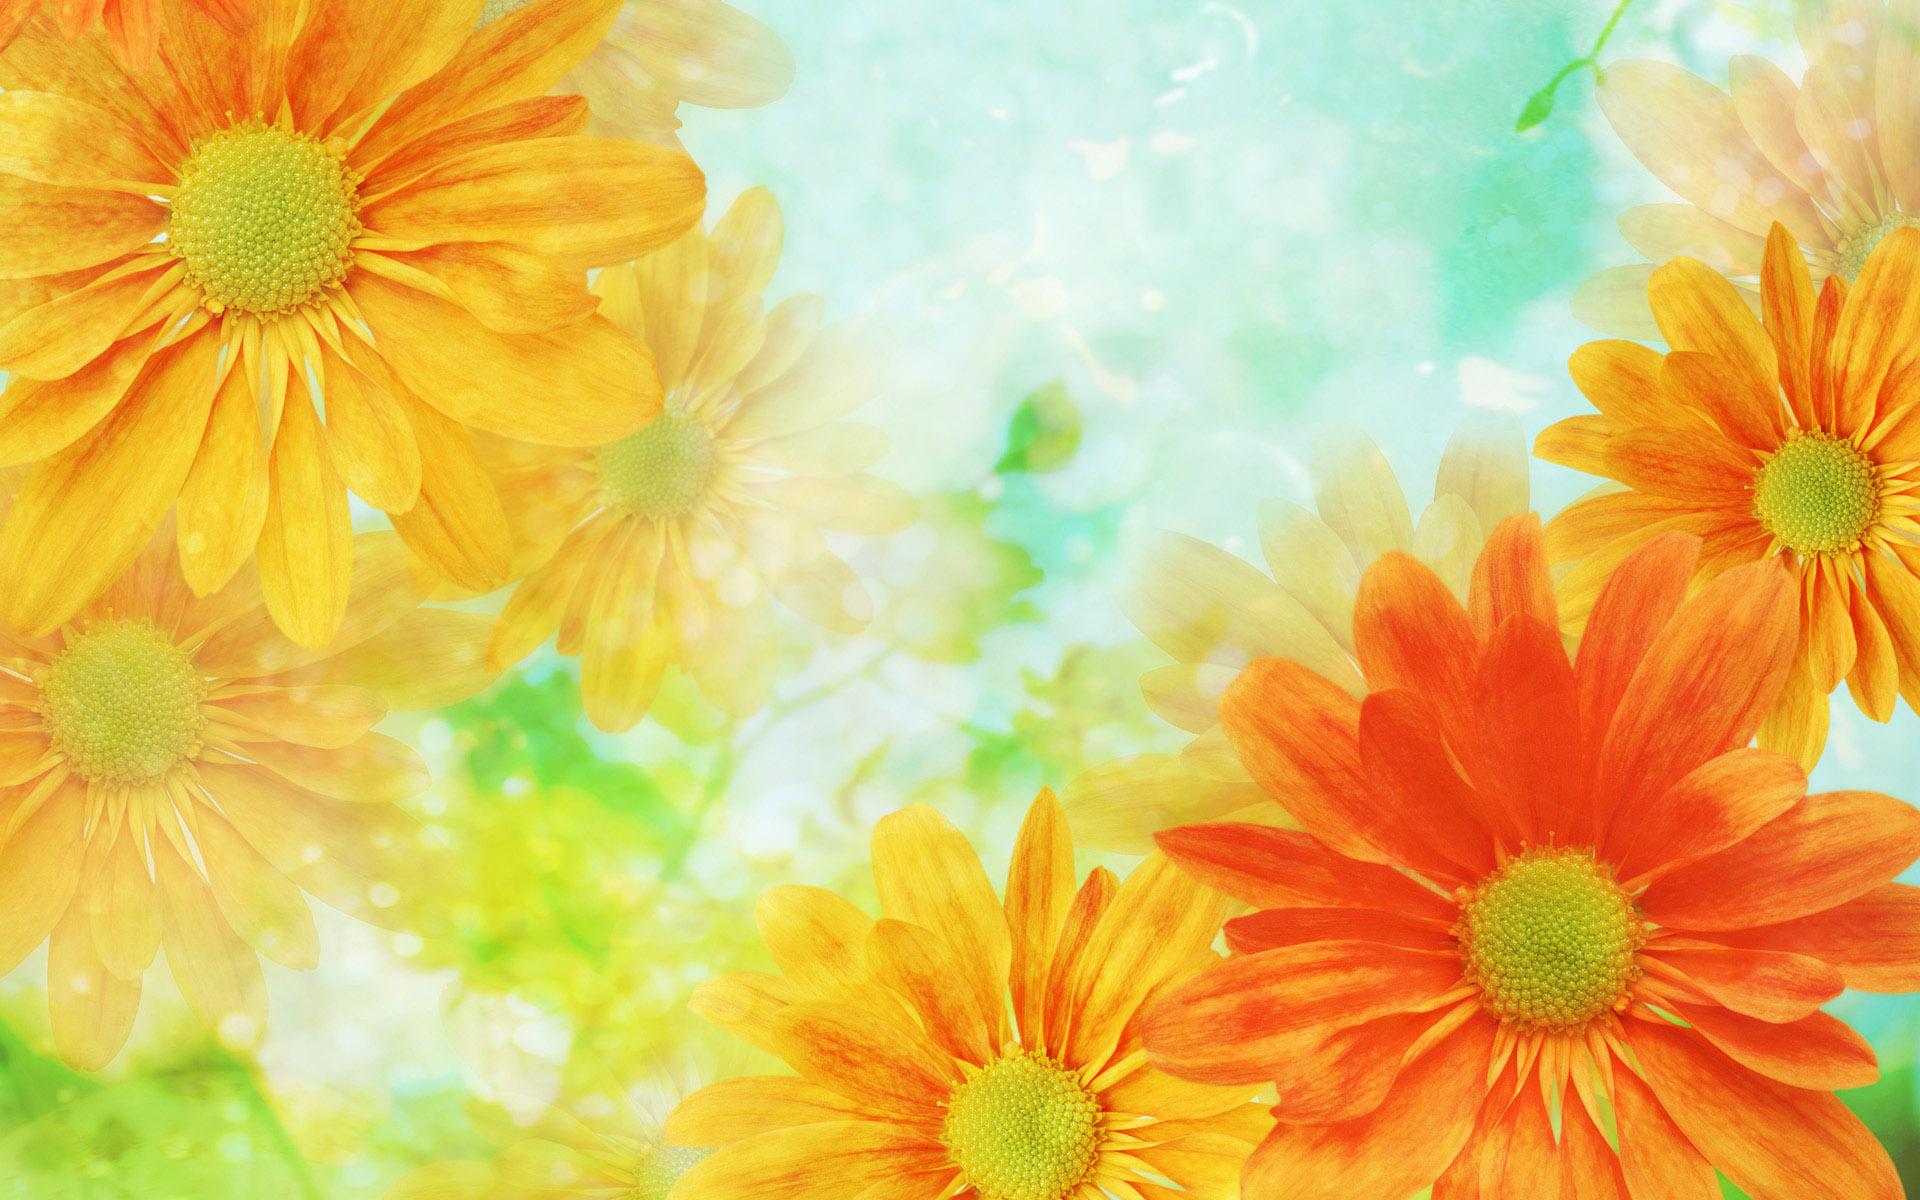 yewllow flowers art 3d